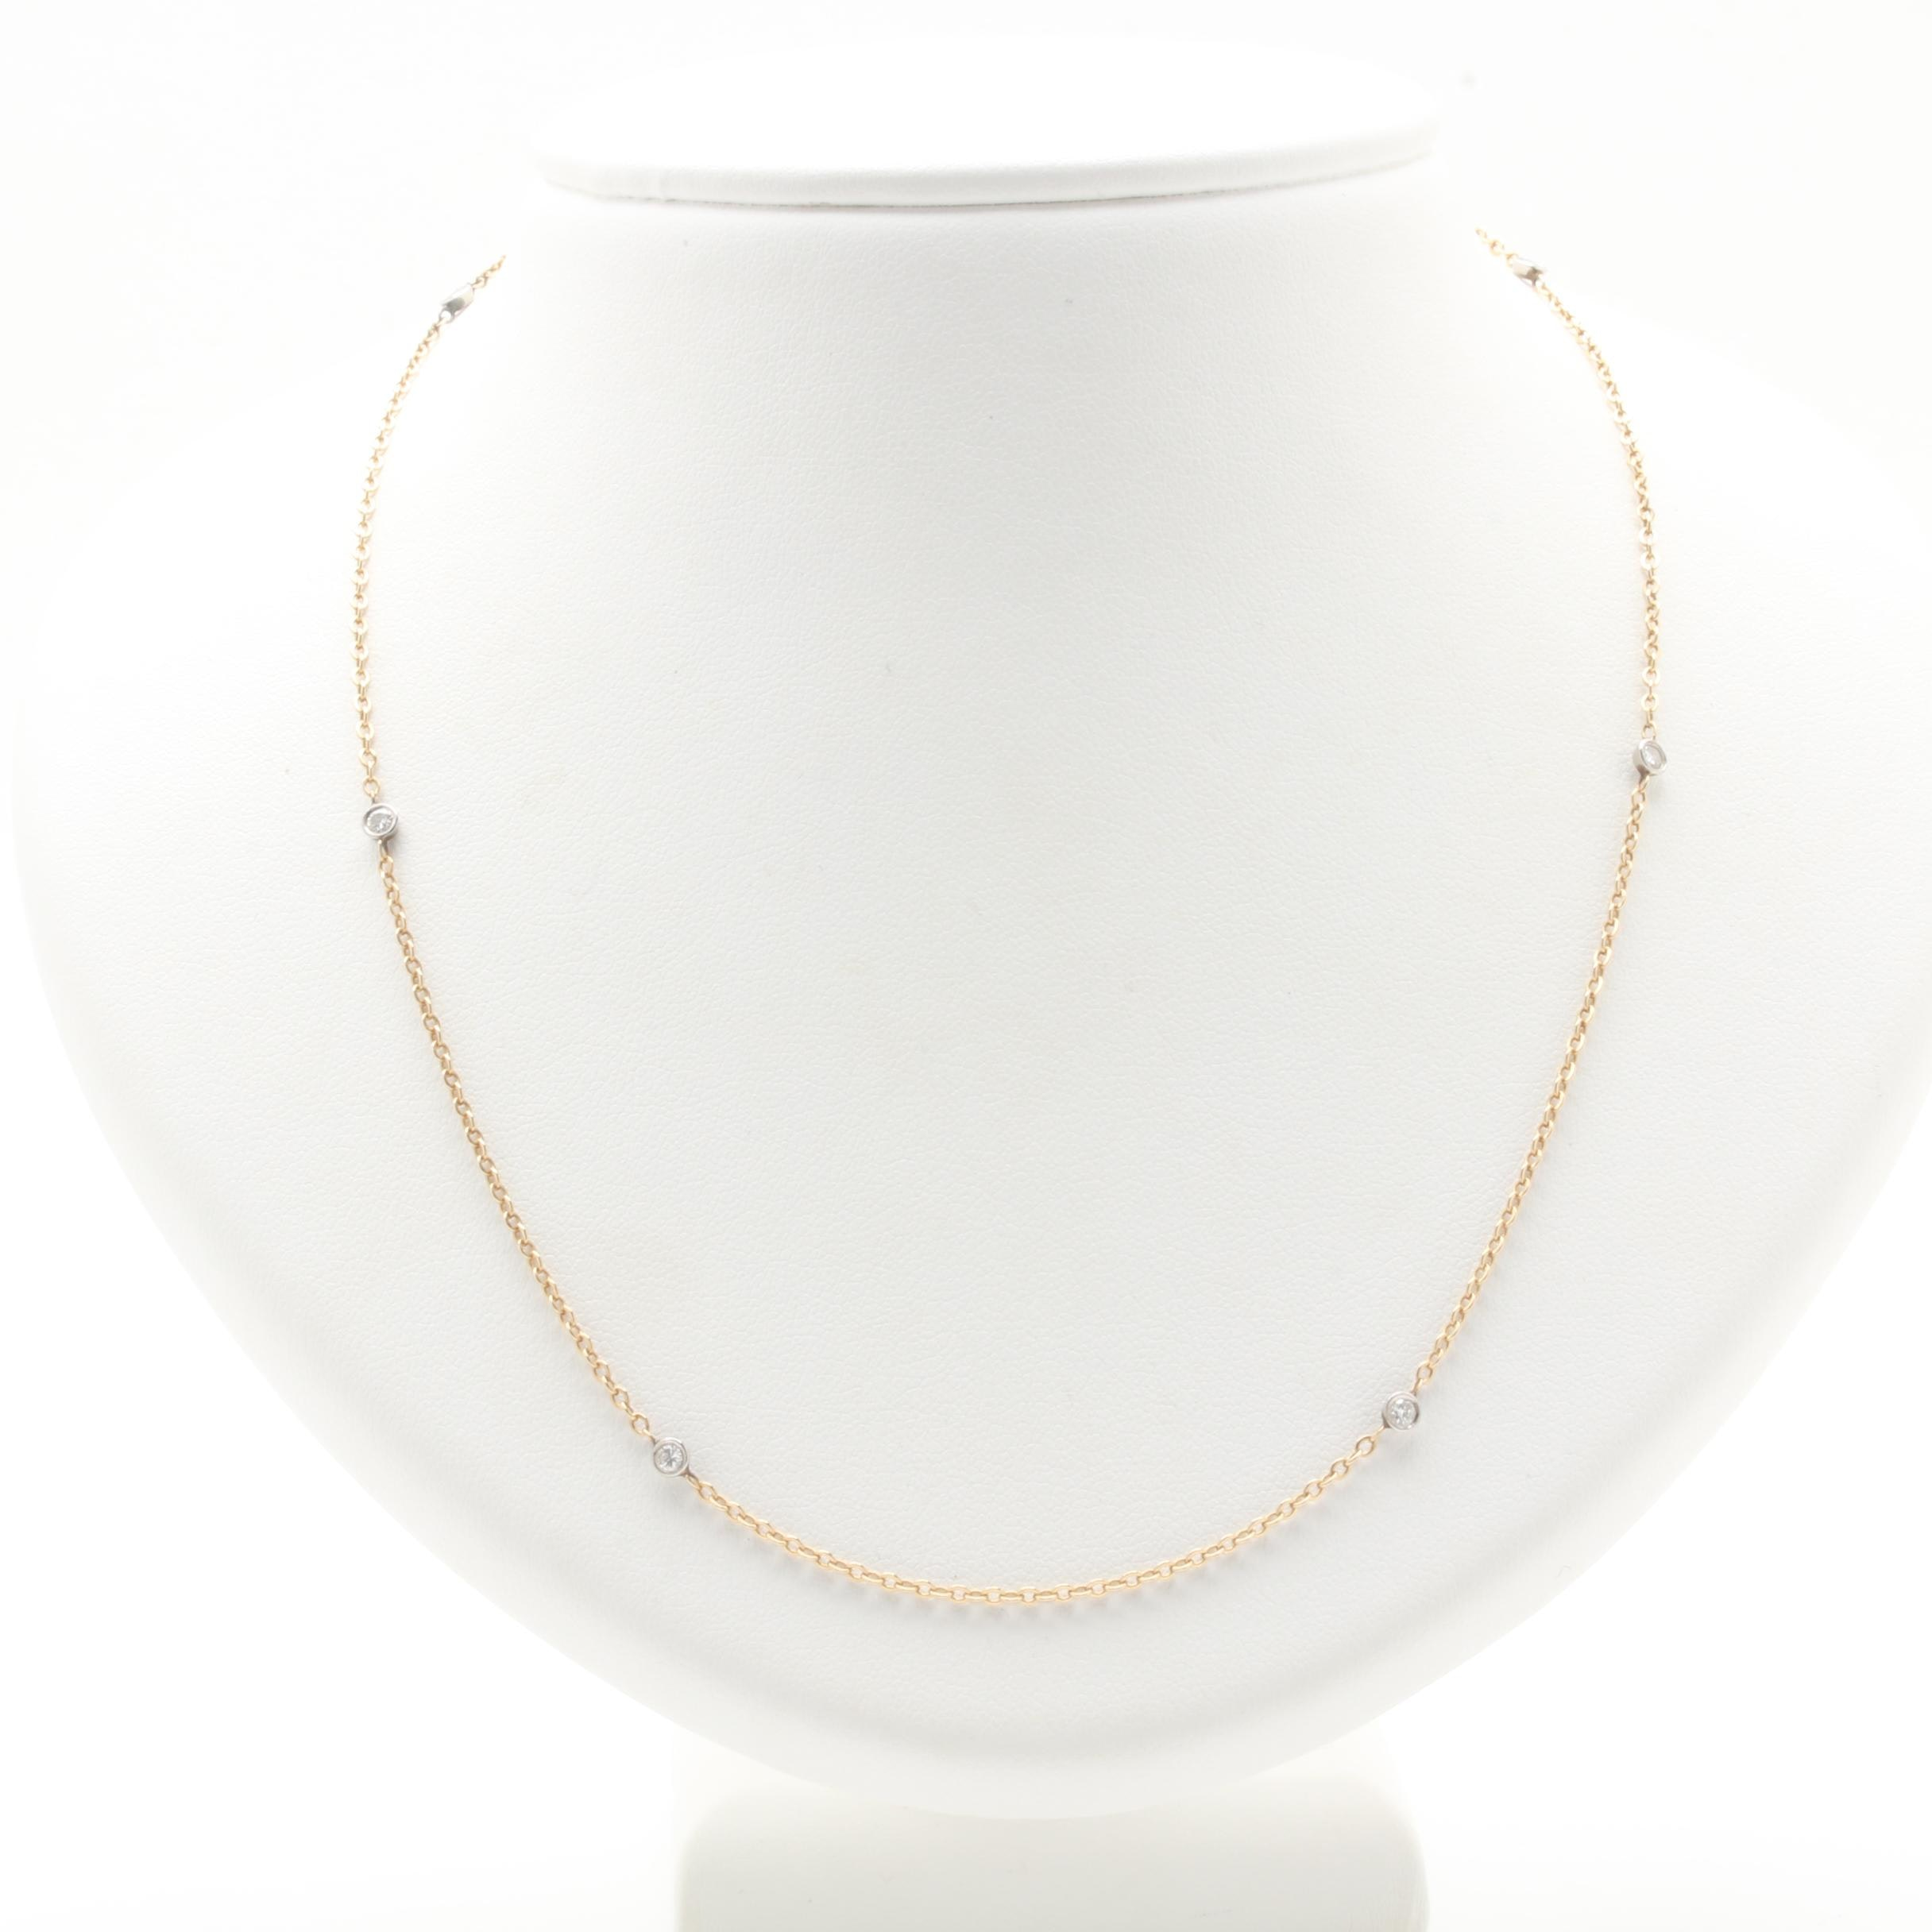 14K Yellow Gold and Palladium Diamond Necklace